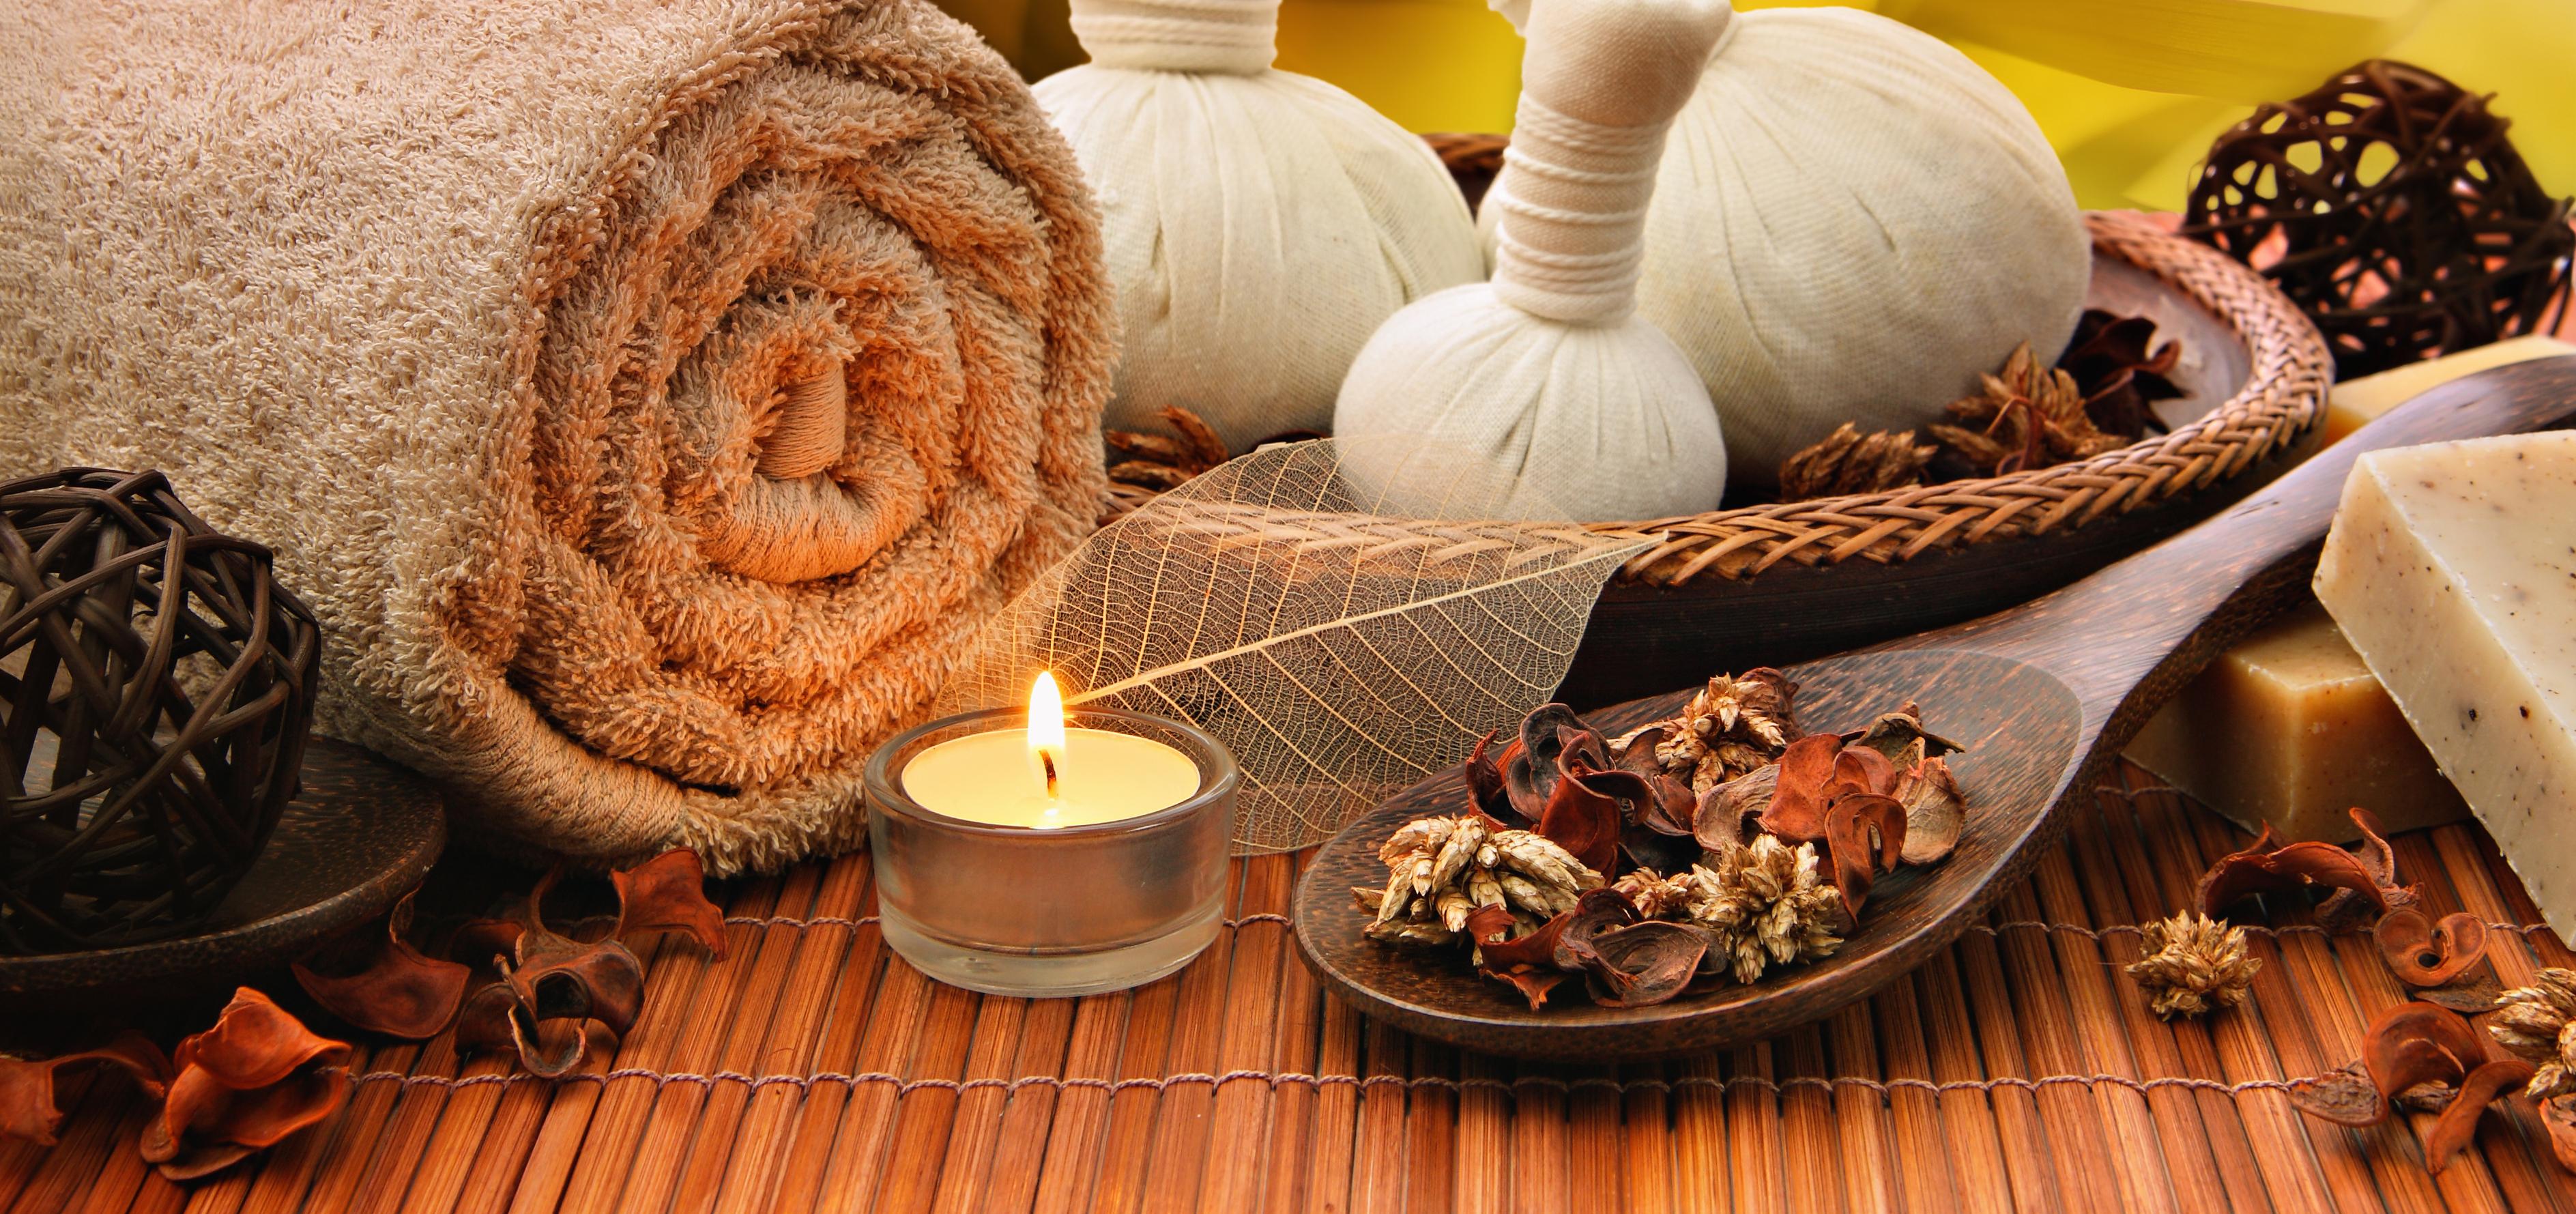 Thai Massage Therapy Sale - Po Thong Thai Massage Therapy